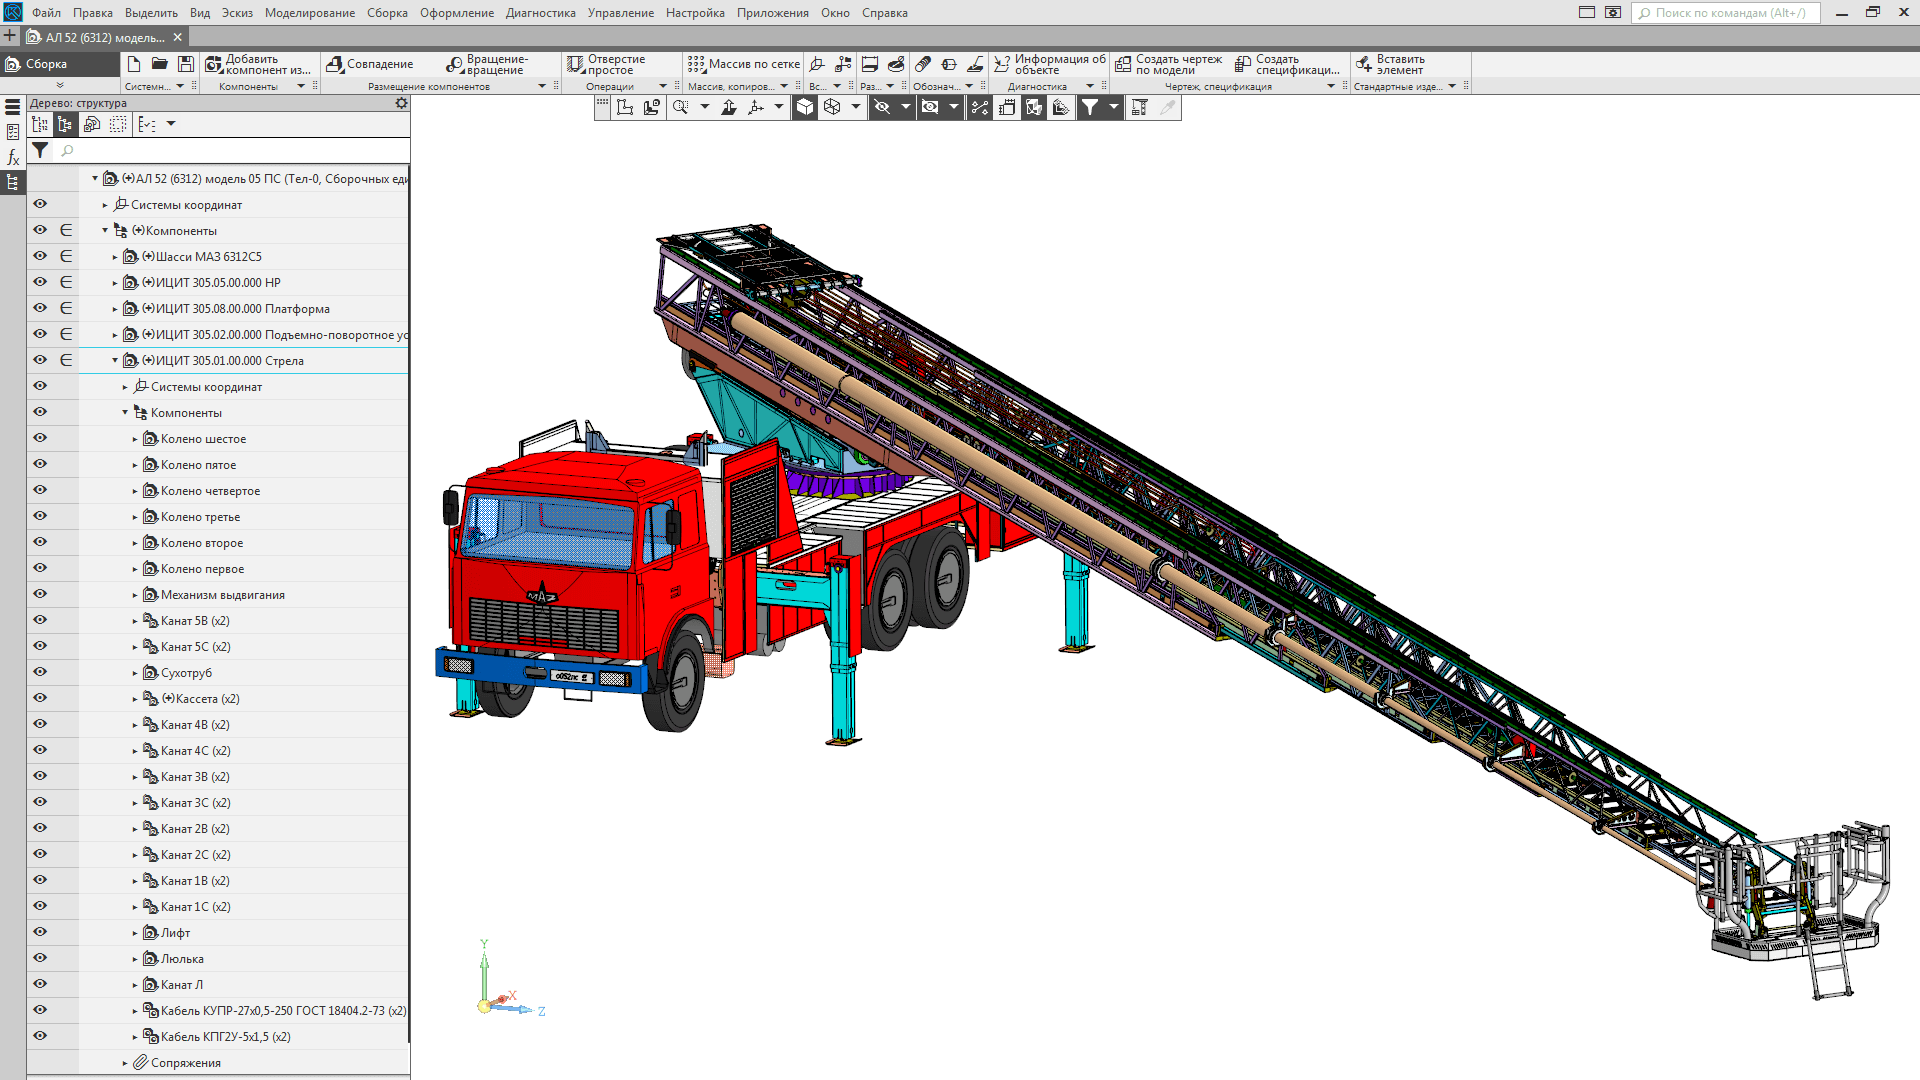 2808907-compressor